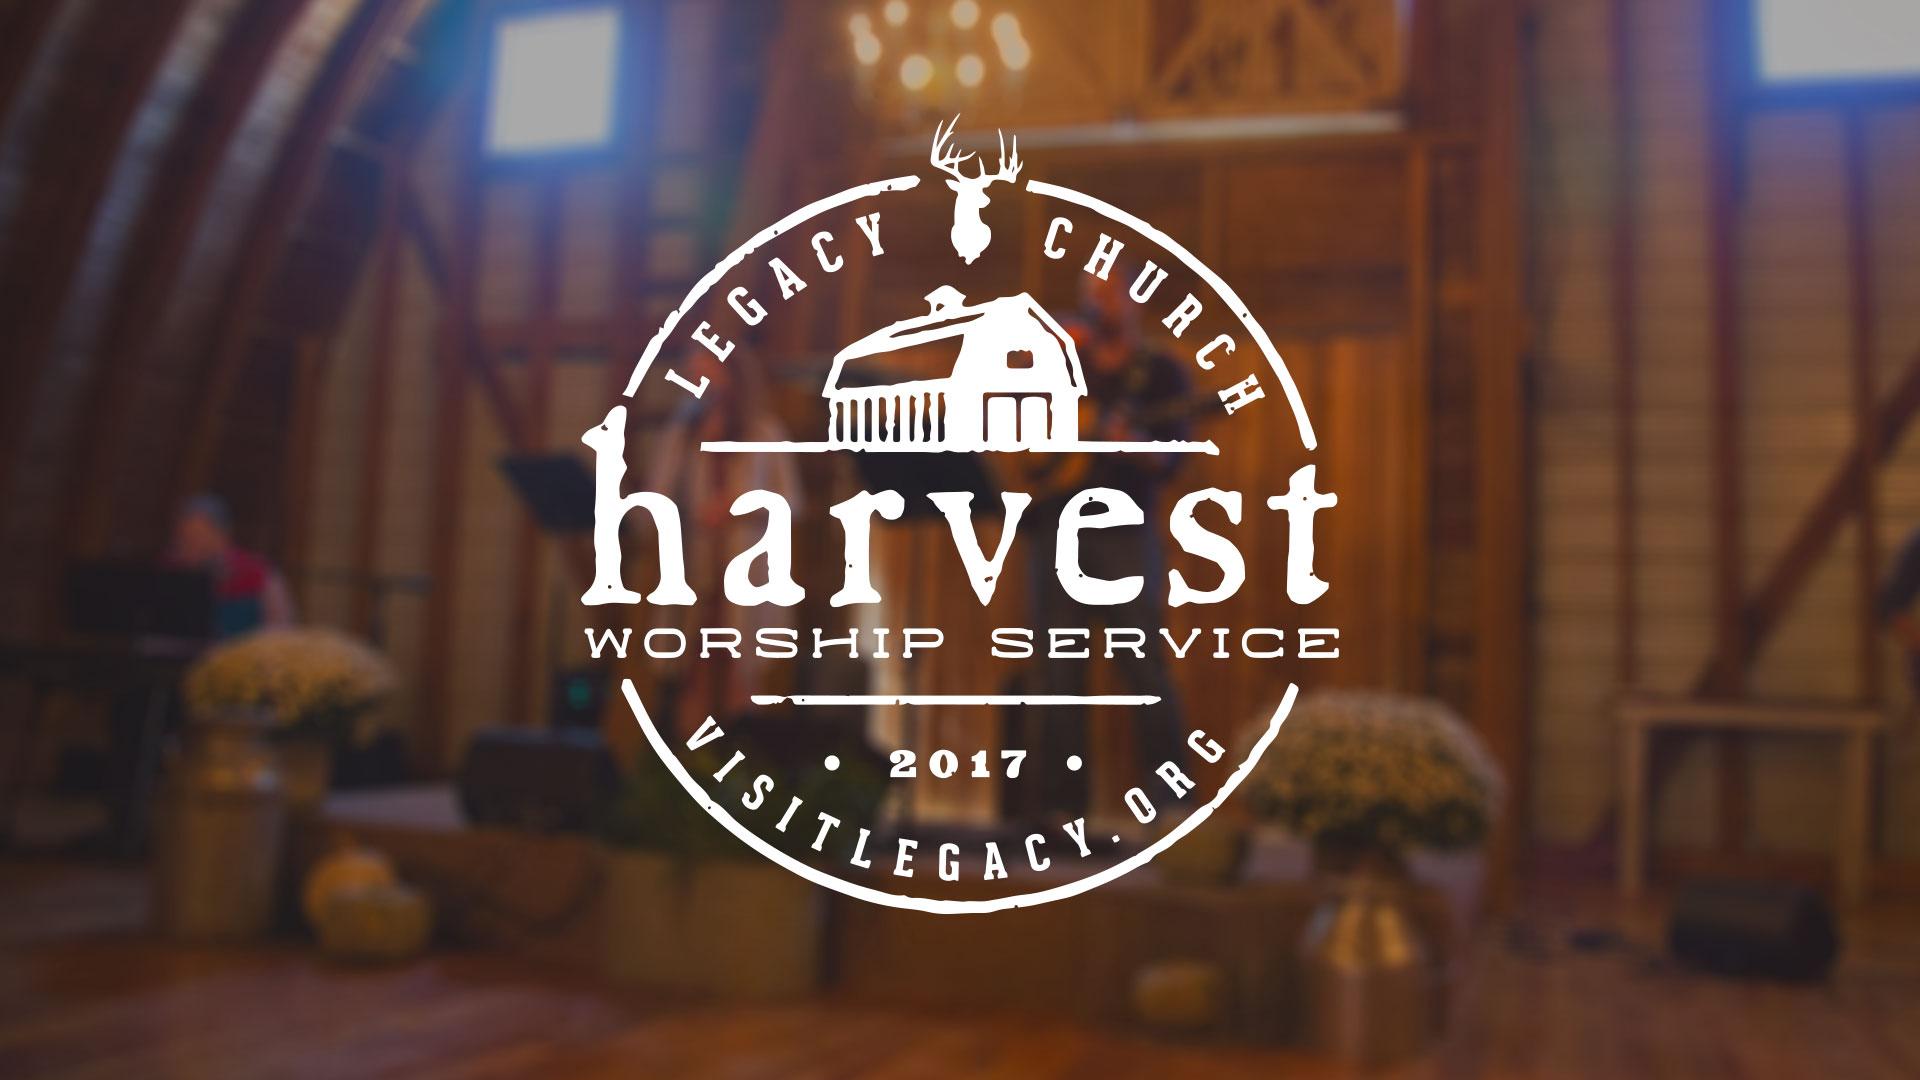 Harvest-Service-slide2.jpg